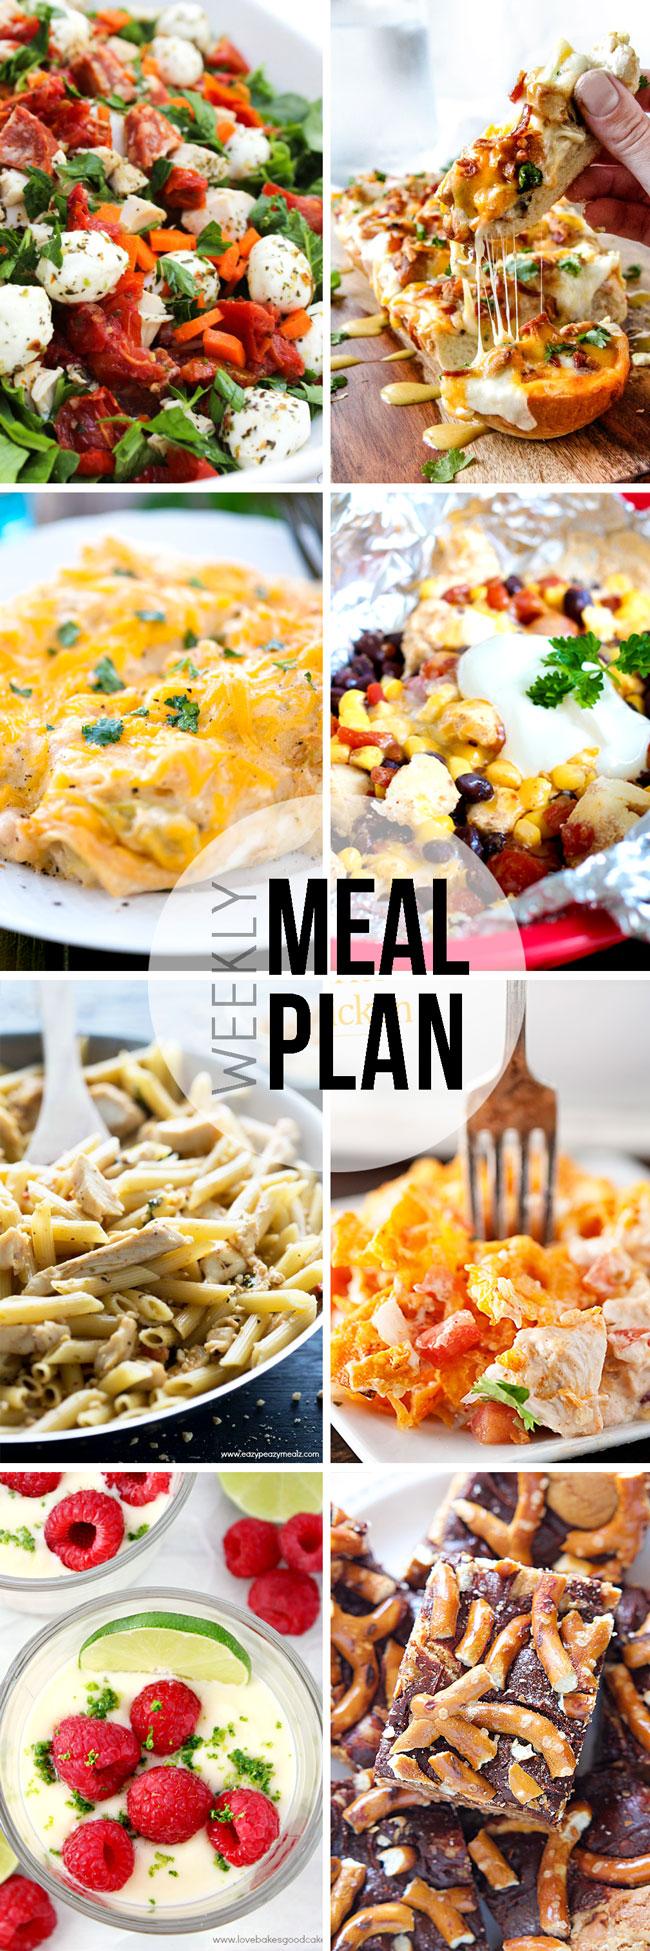 Meal-Plan---Pinterest-32